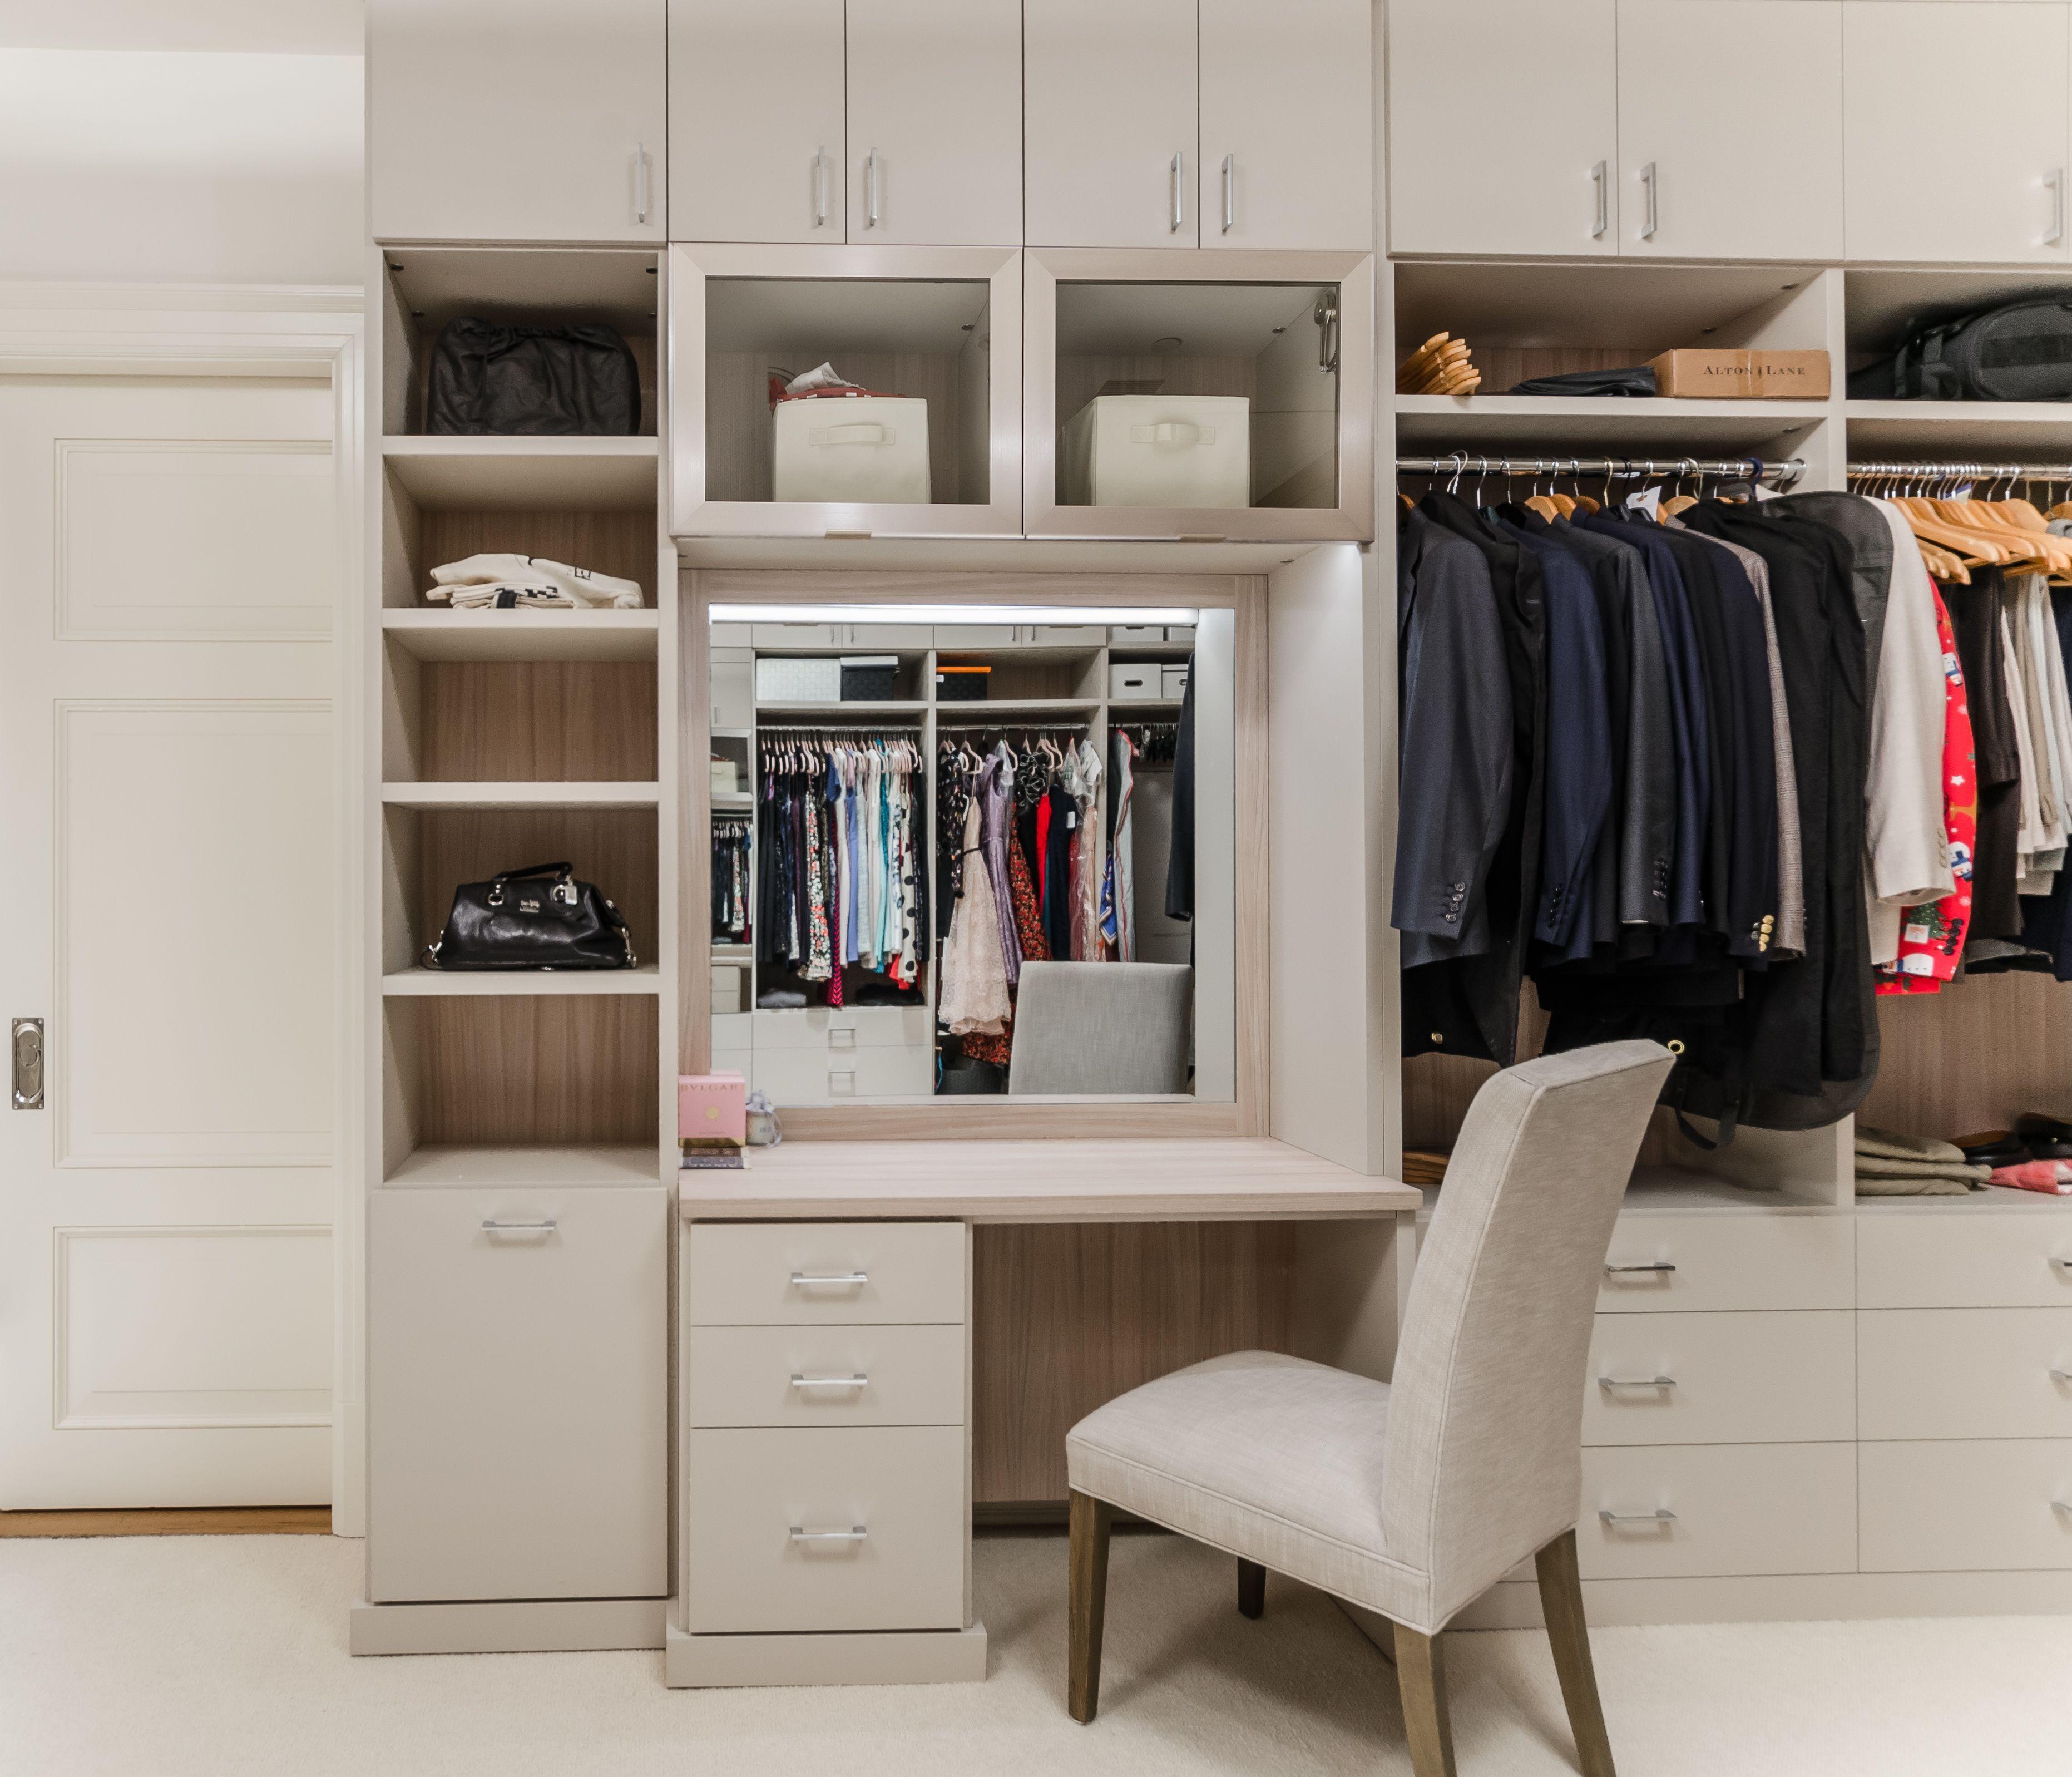 Design With Intention Closet Storage Design California Closets Custom Storage